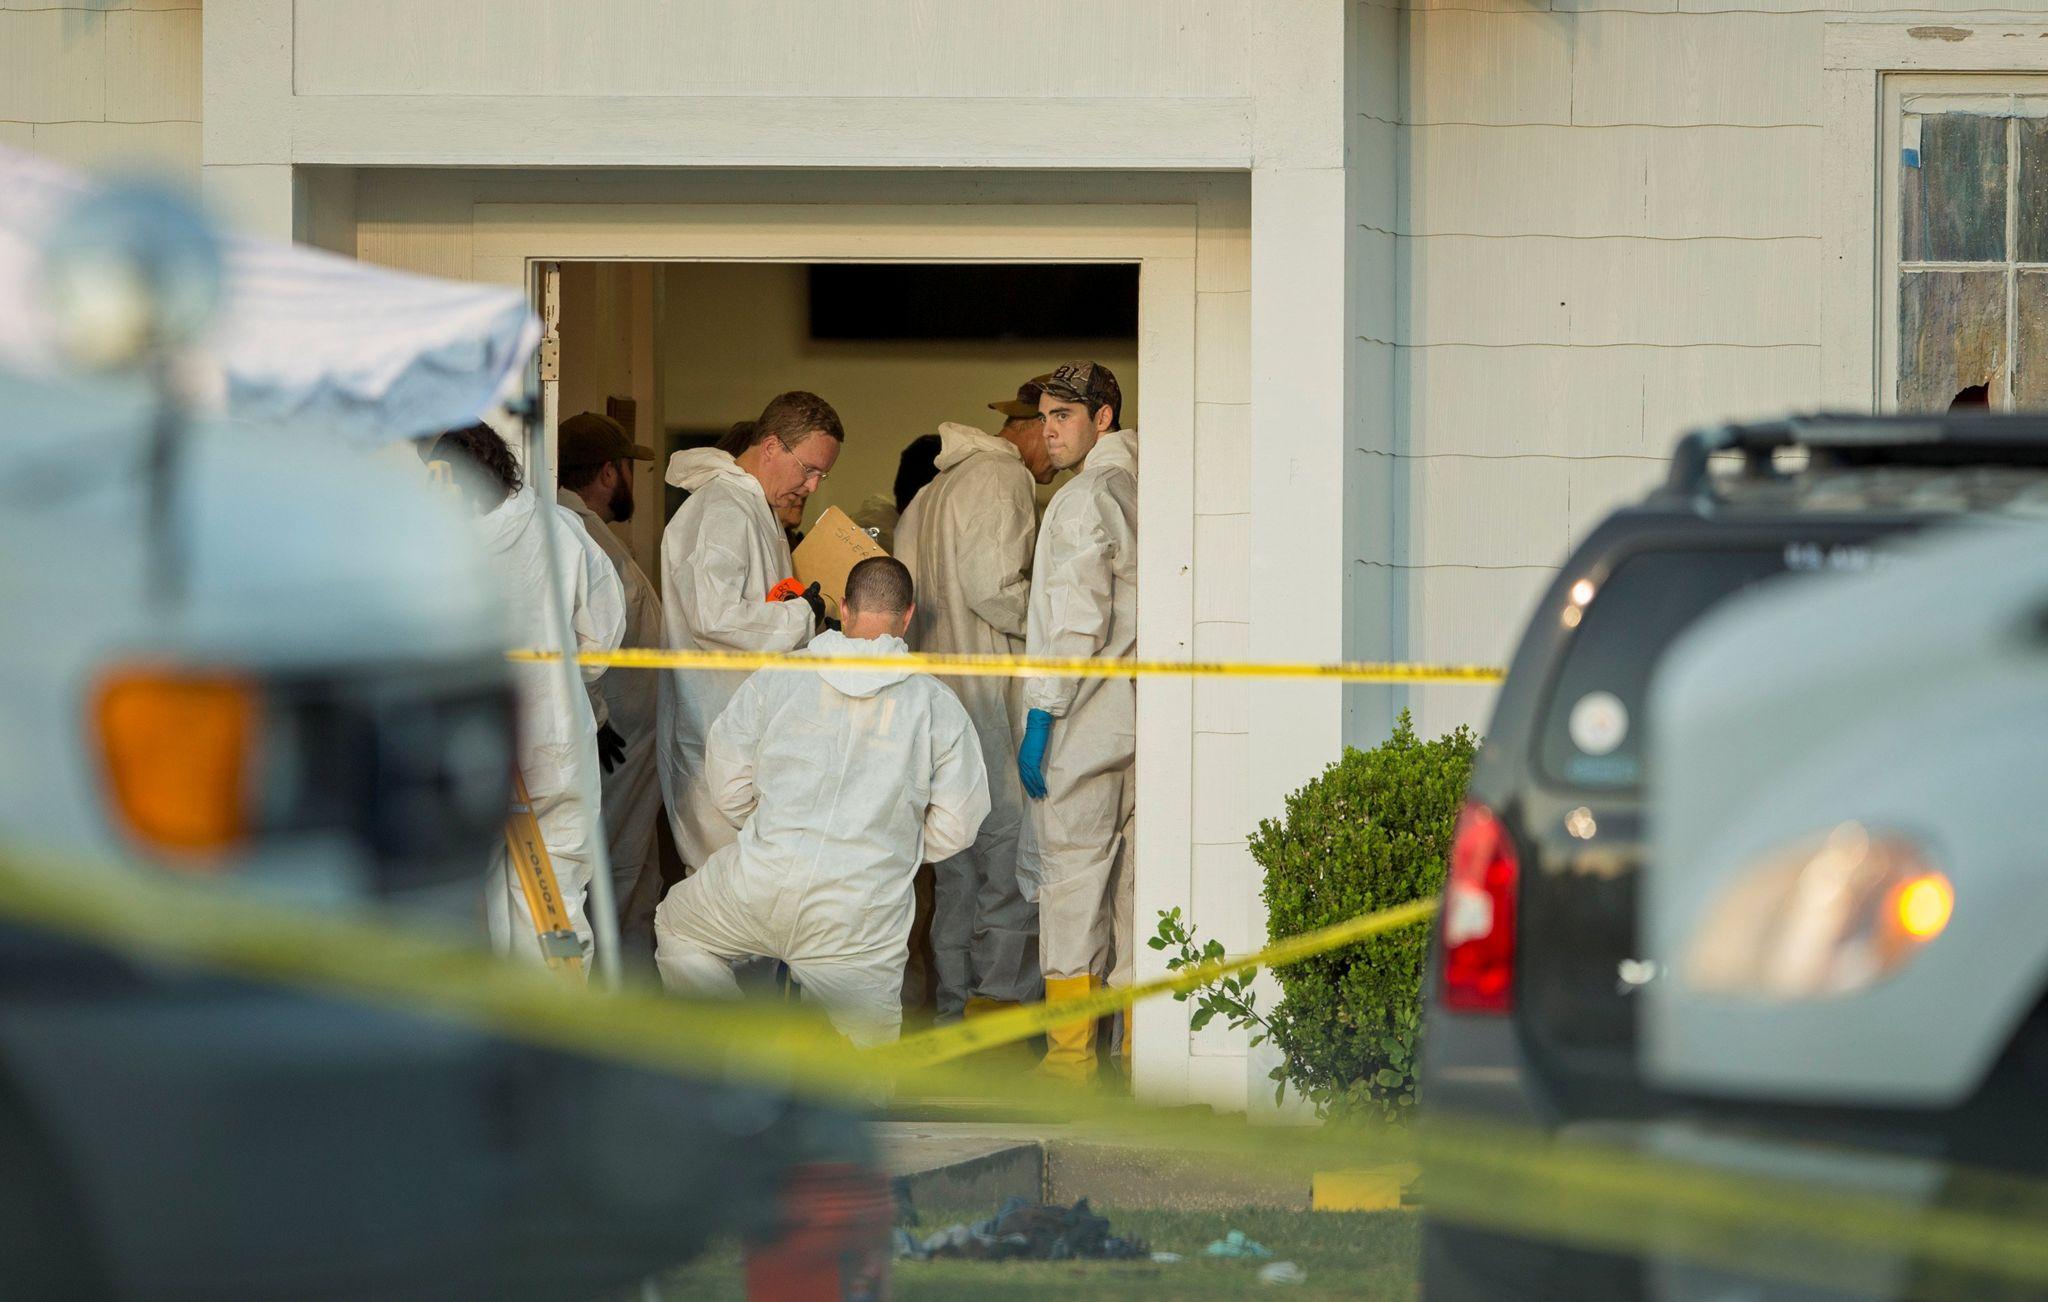 Law enforcement officials investigating